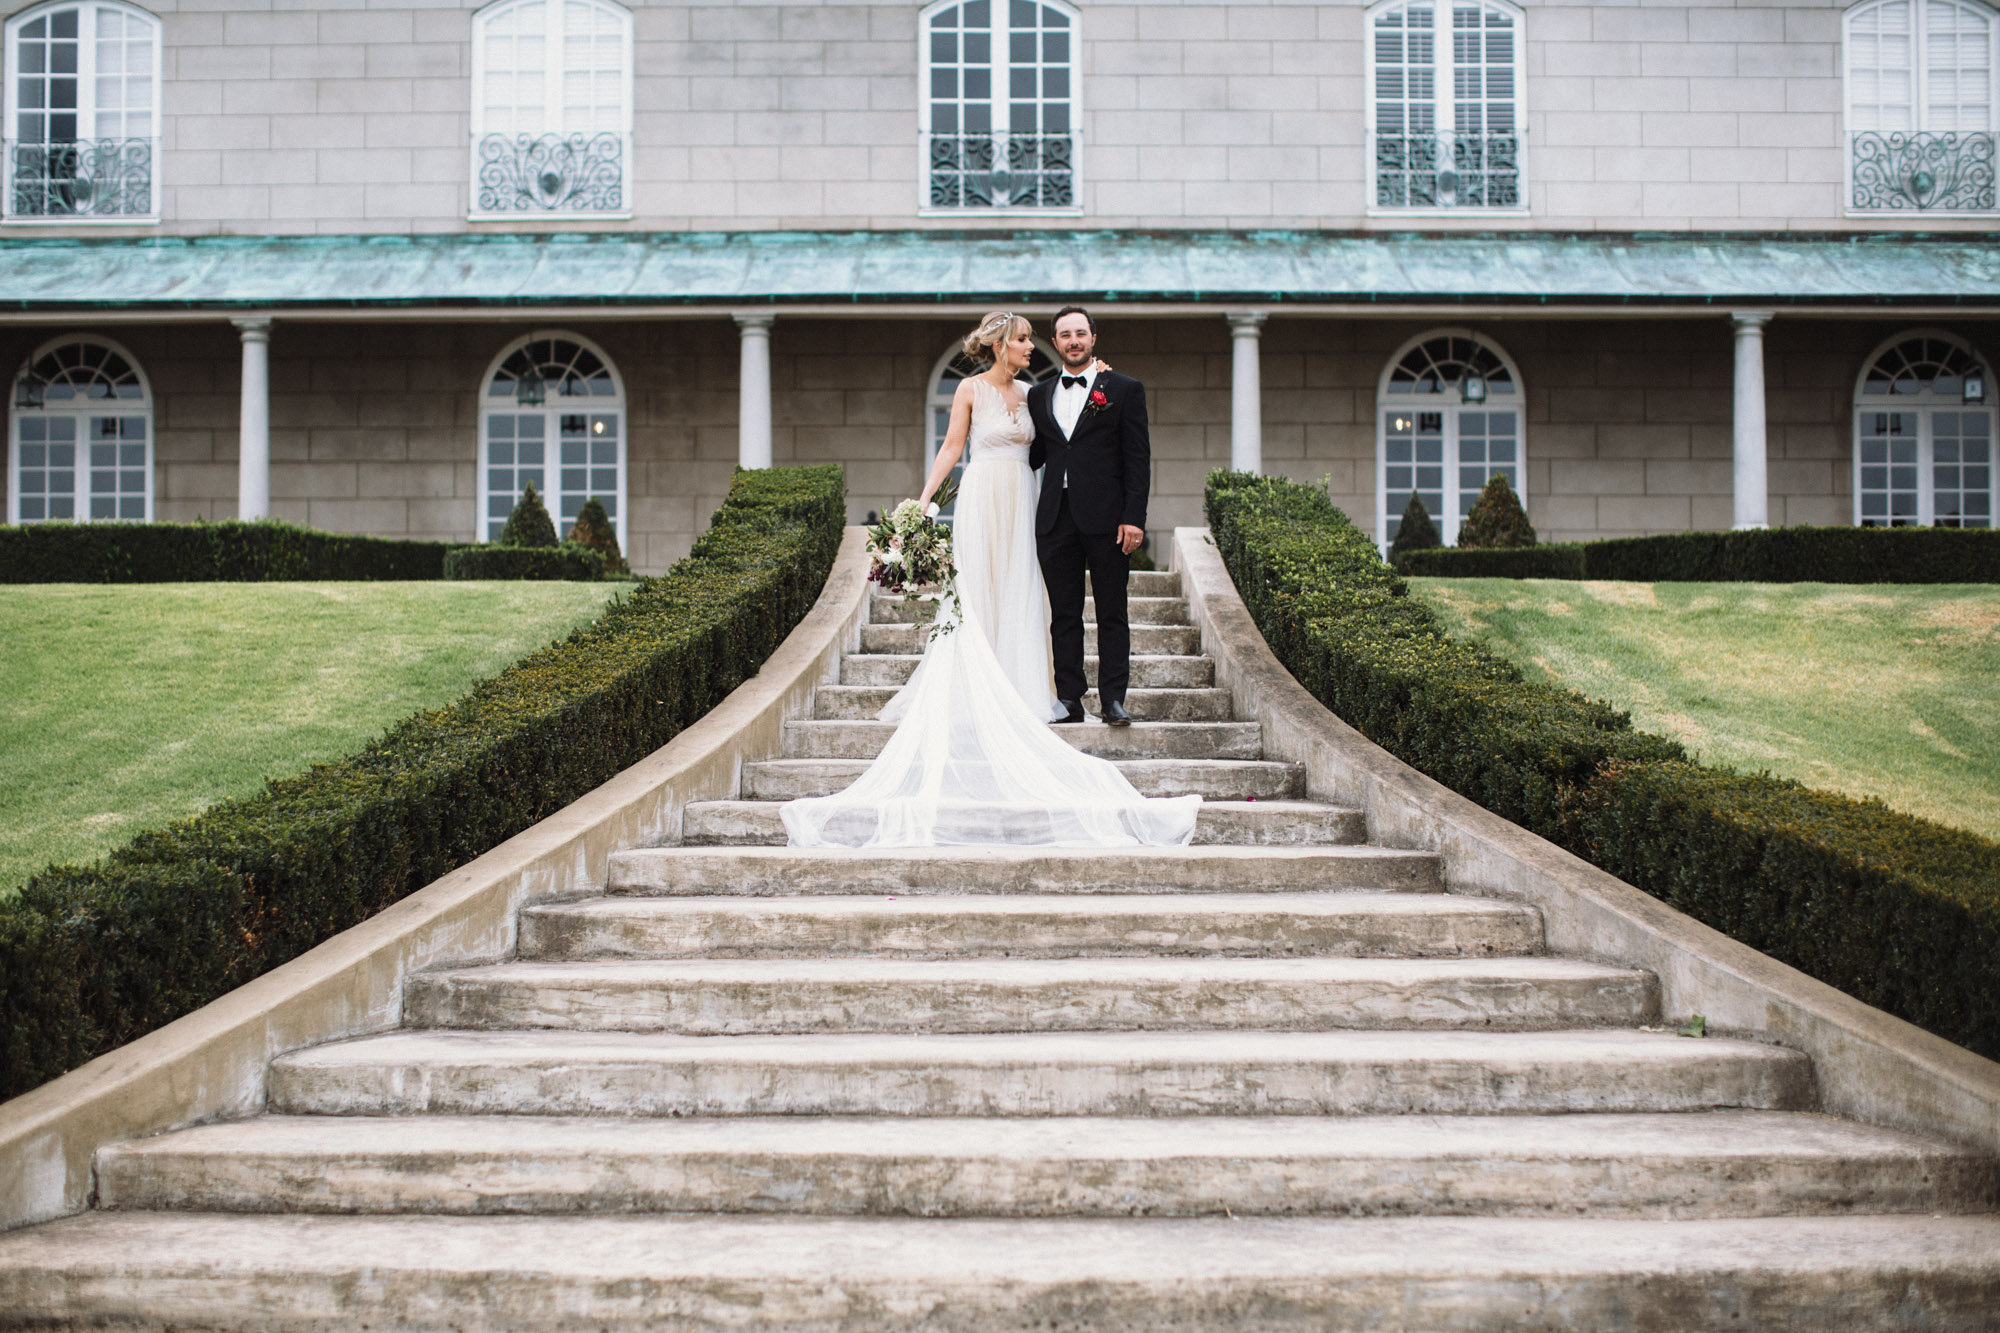 Campbell Point House Wedding HJ + Dean Raphael Weddings-91.jpg